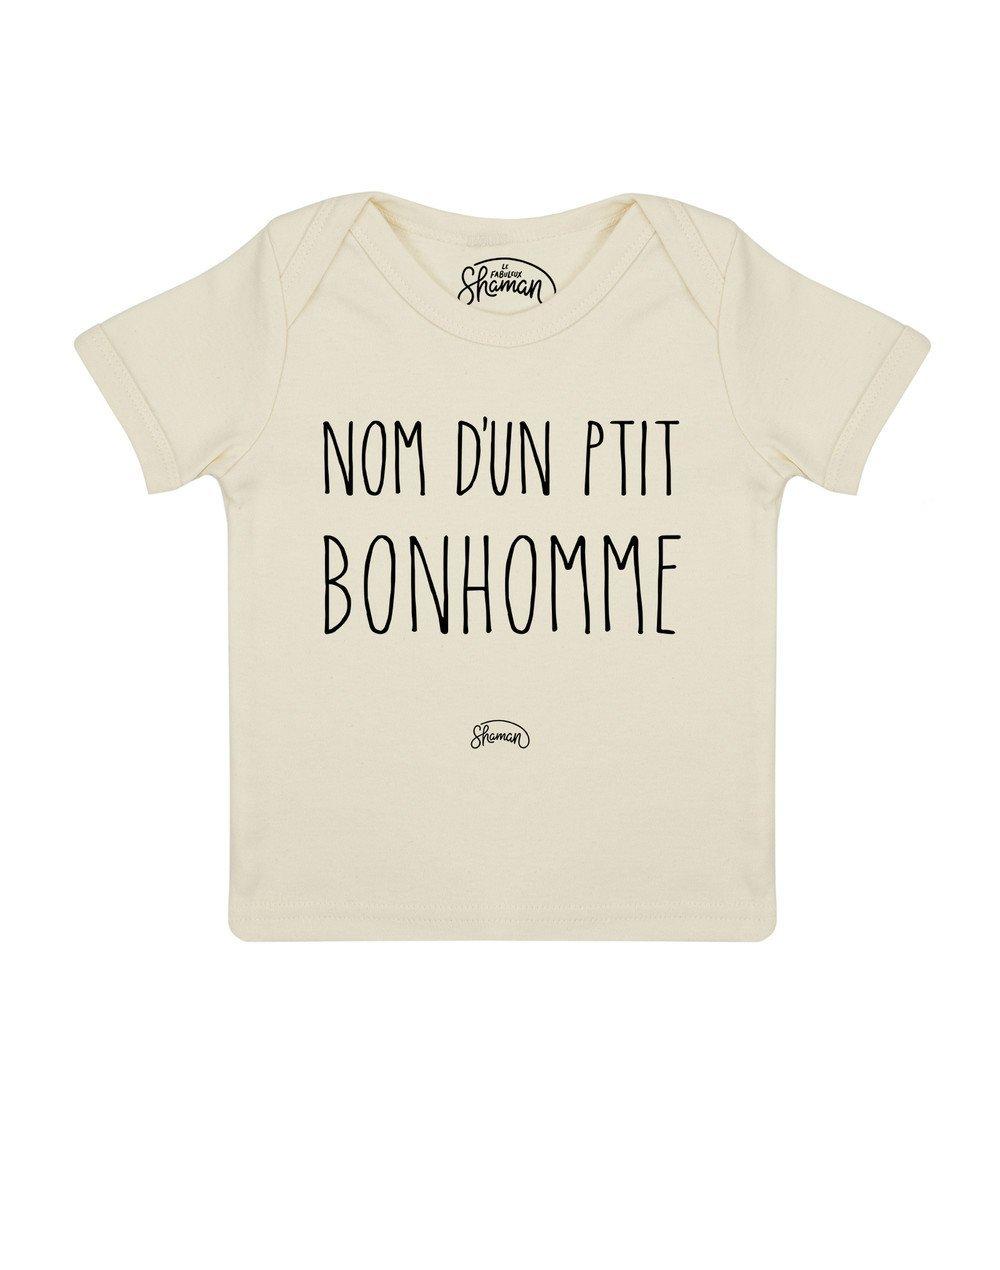 Tee shirt Nom d'un p'tit